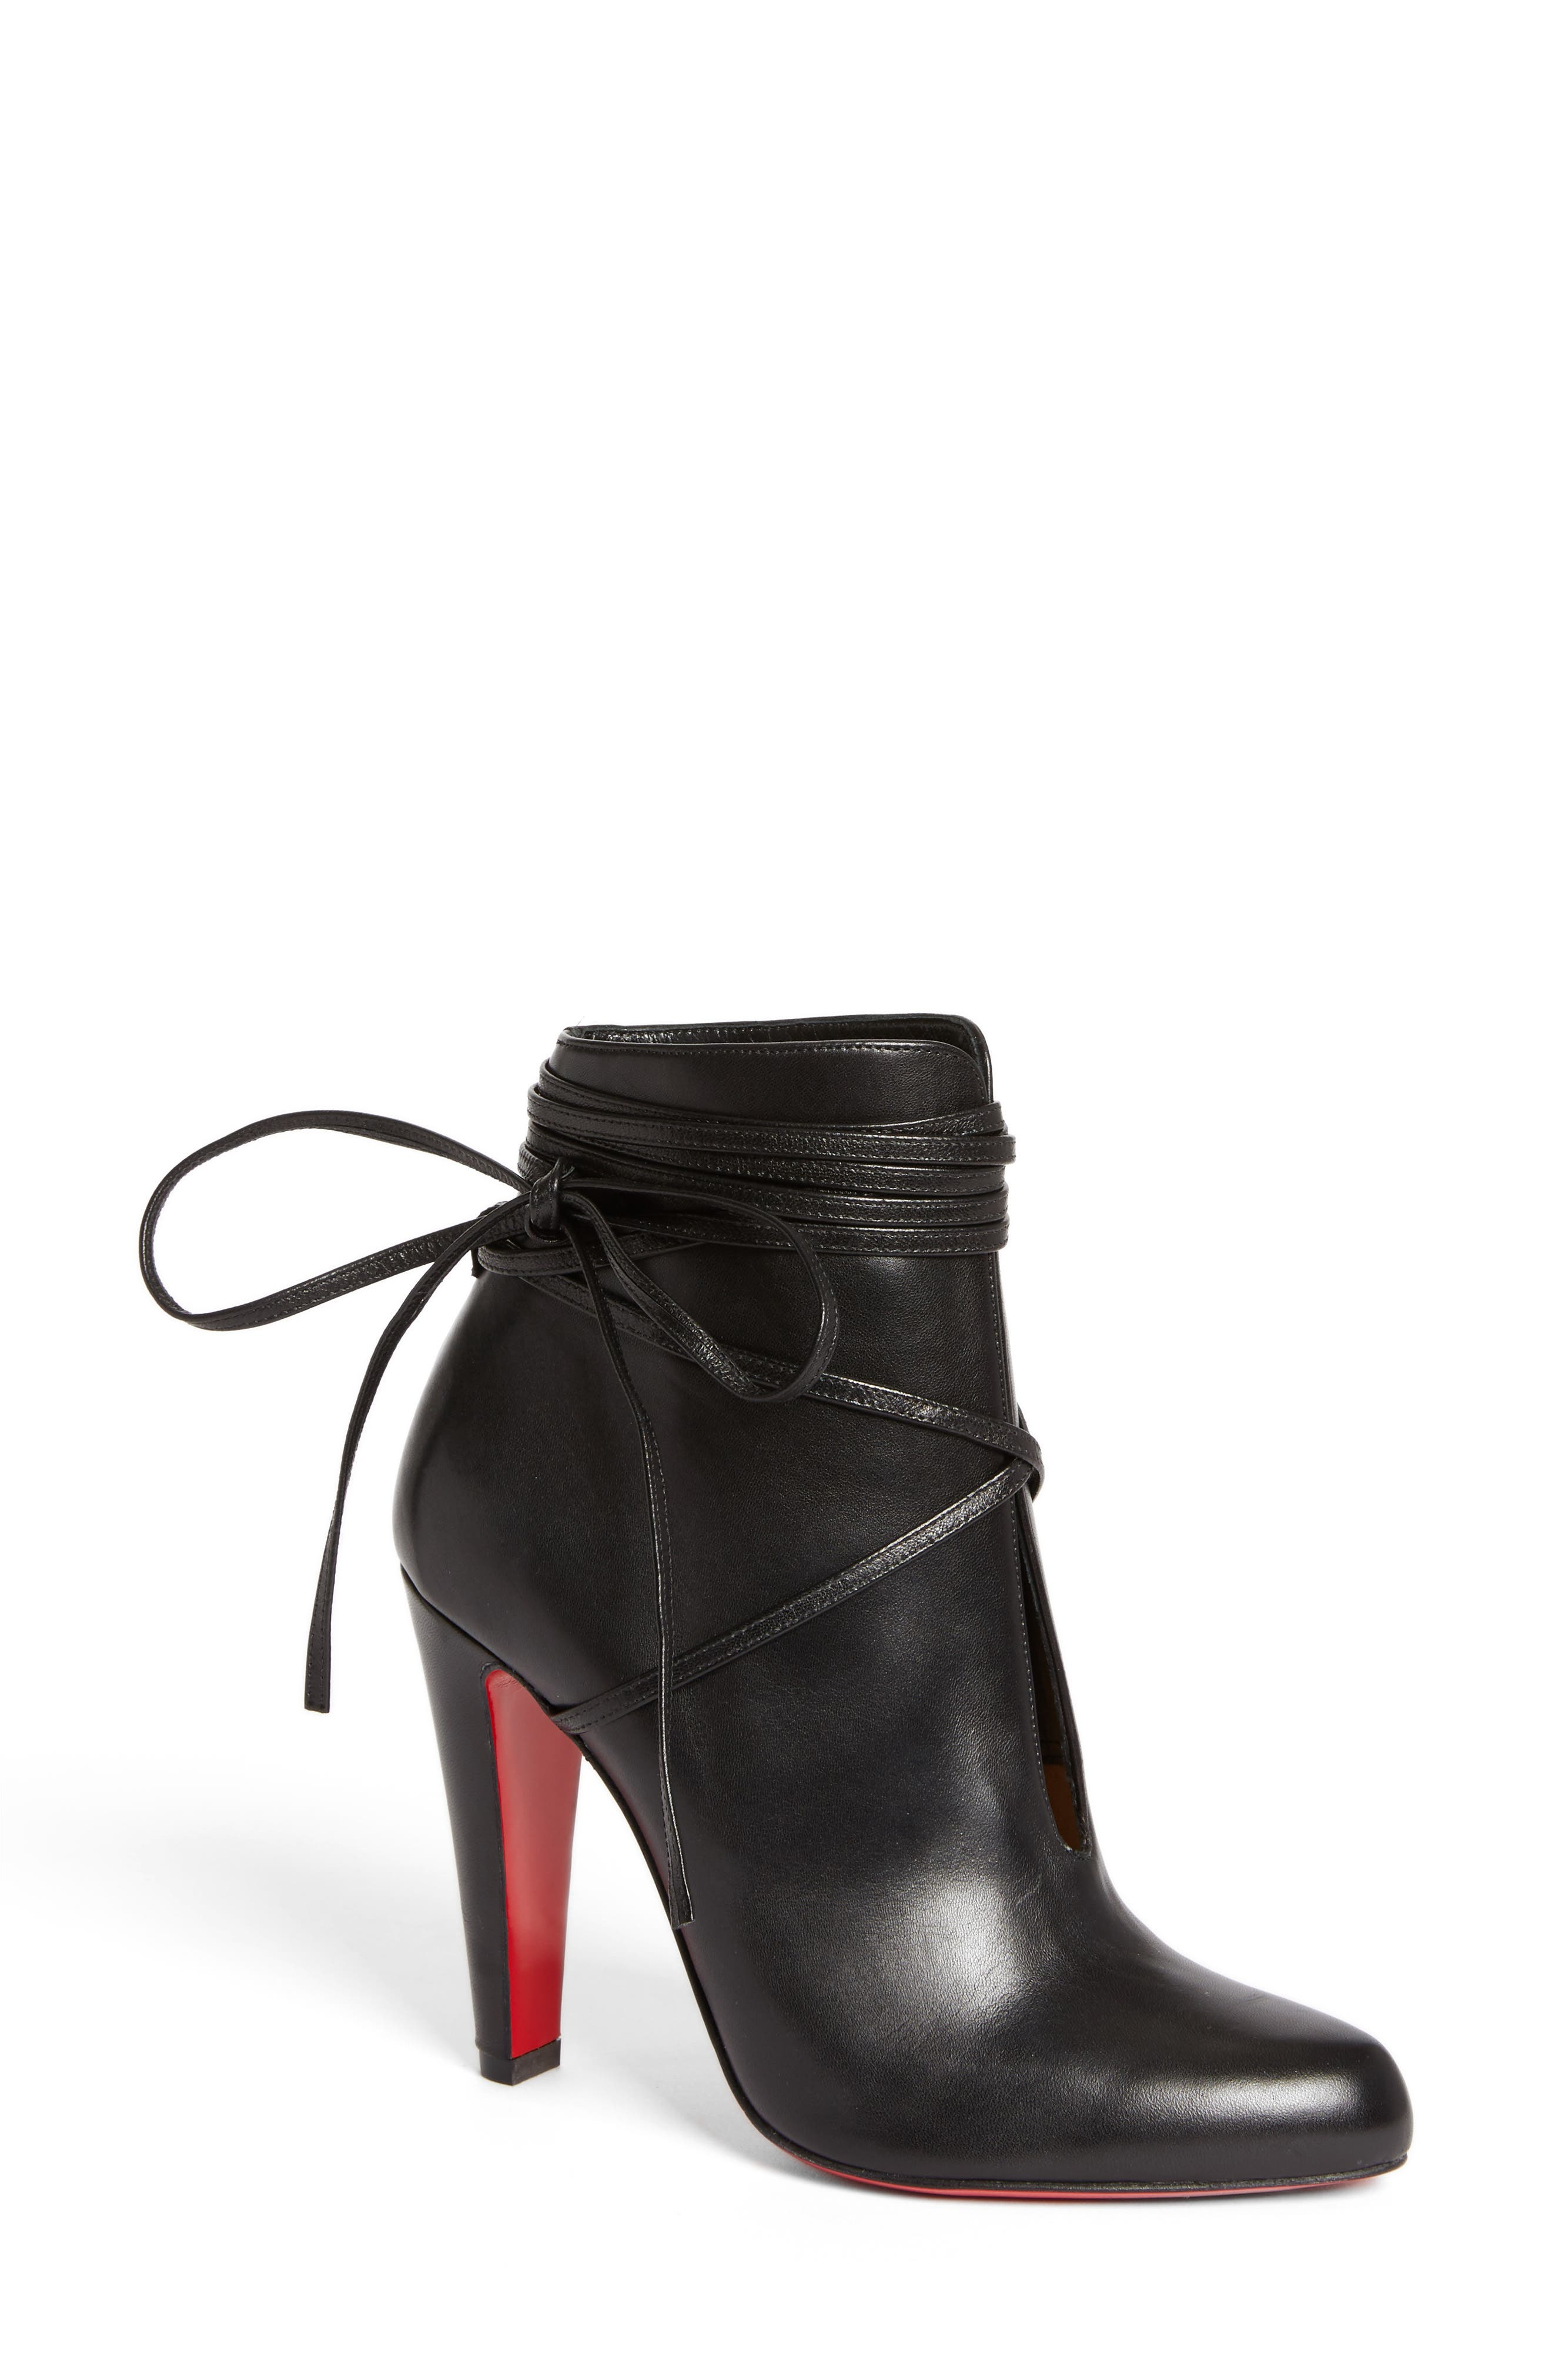 Christian Louboutin Ankle Tie Bootie (Women)